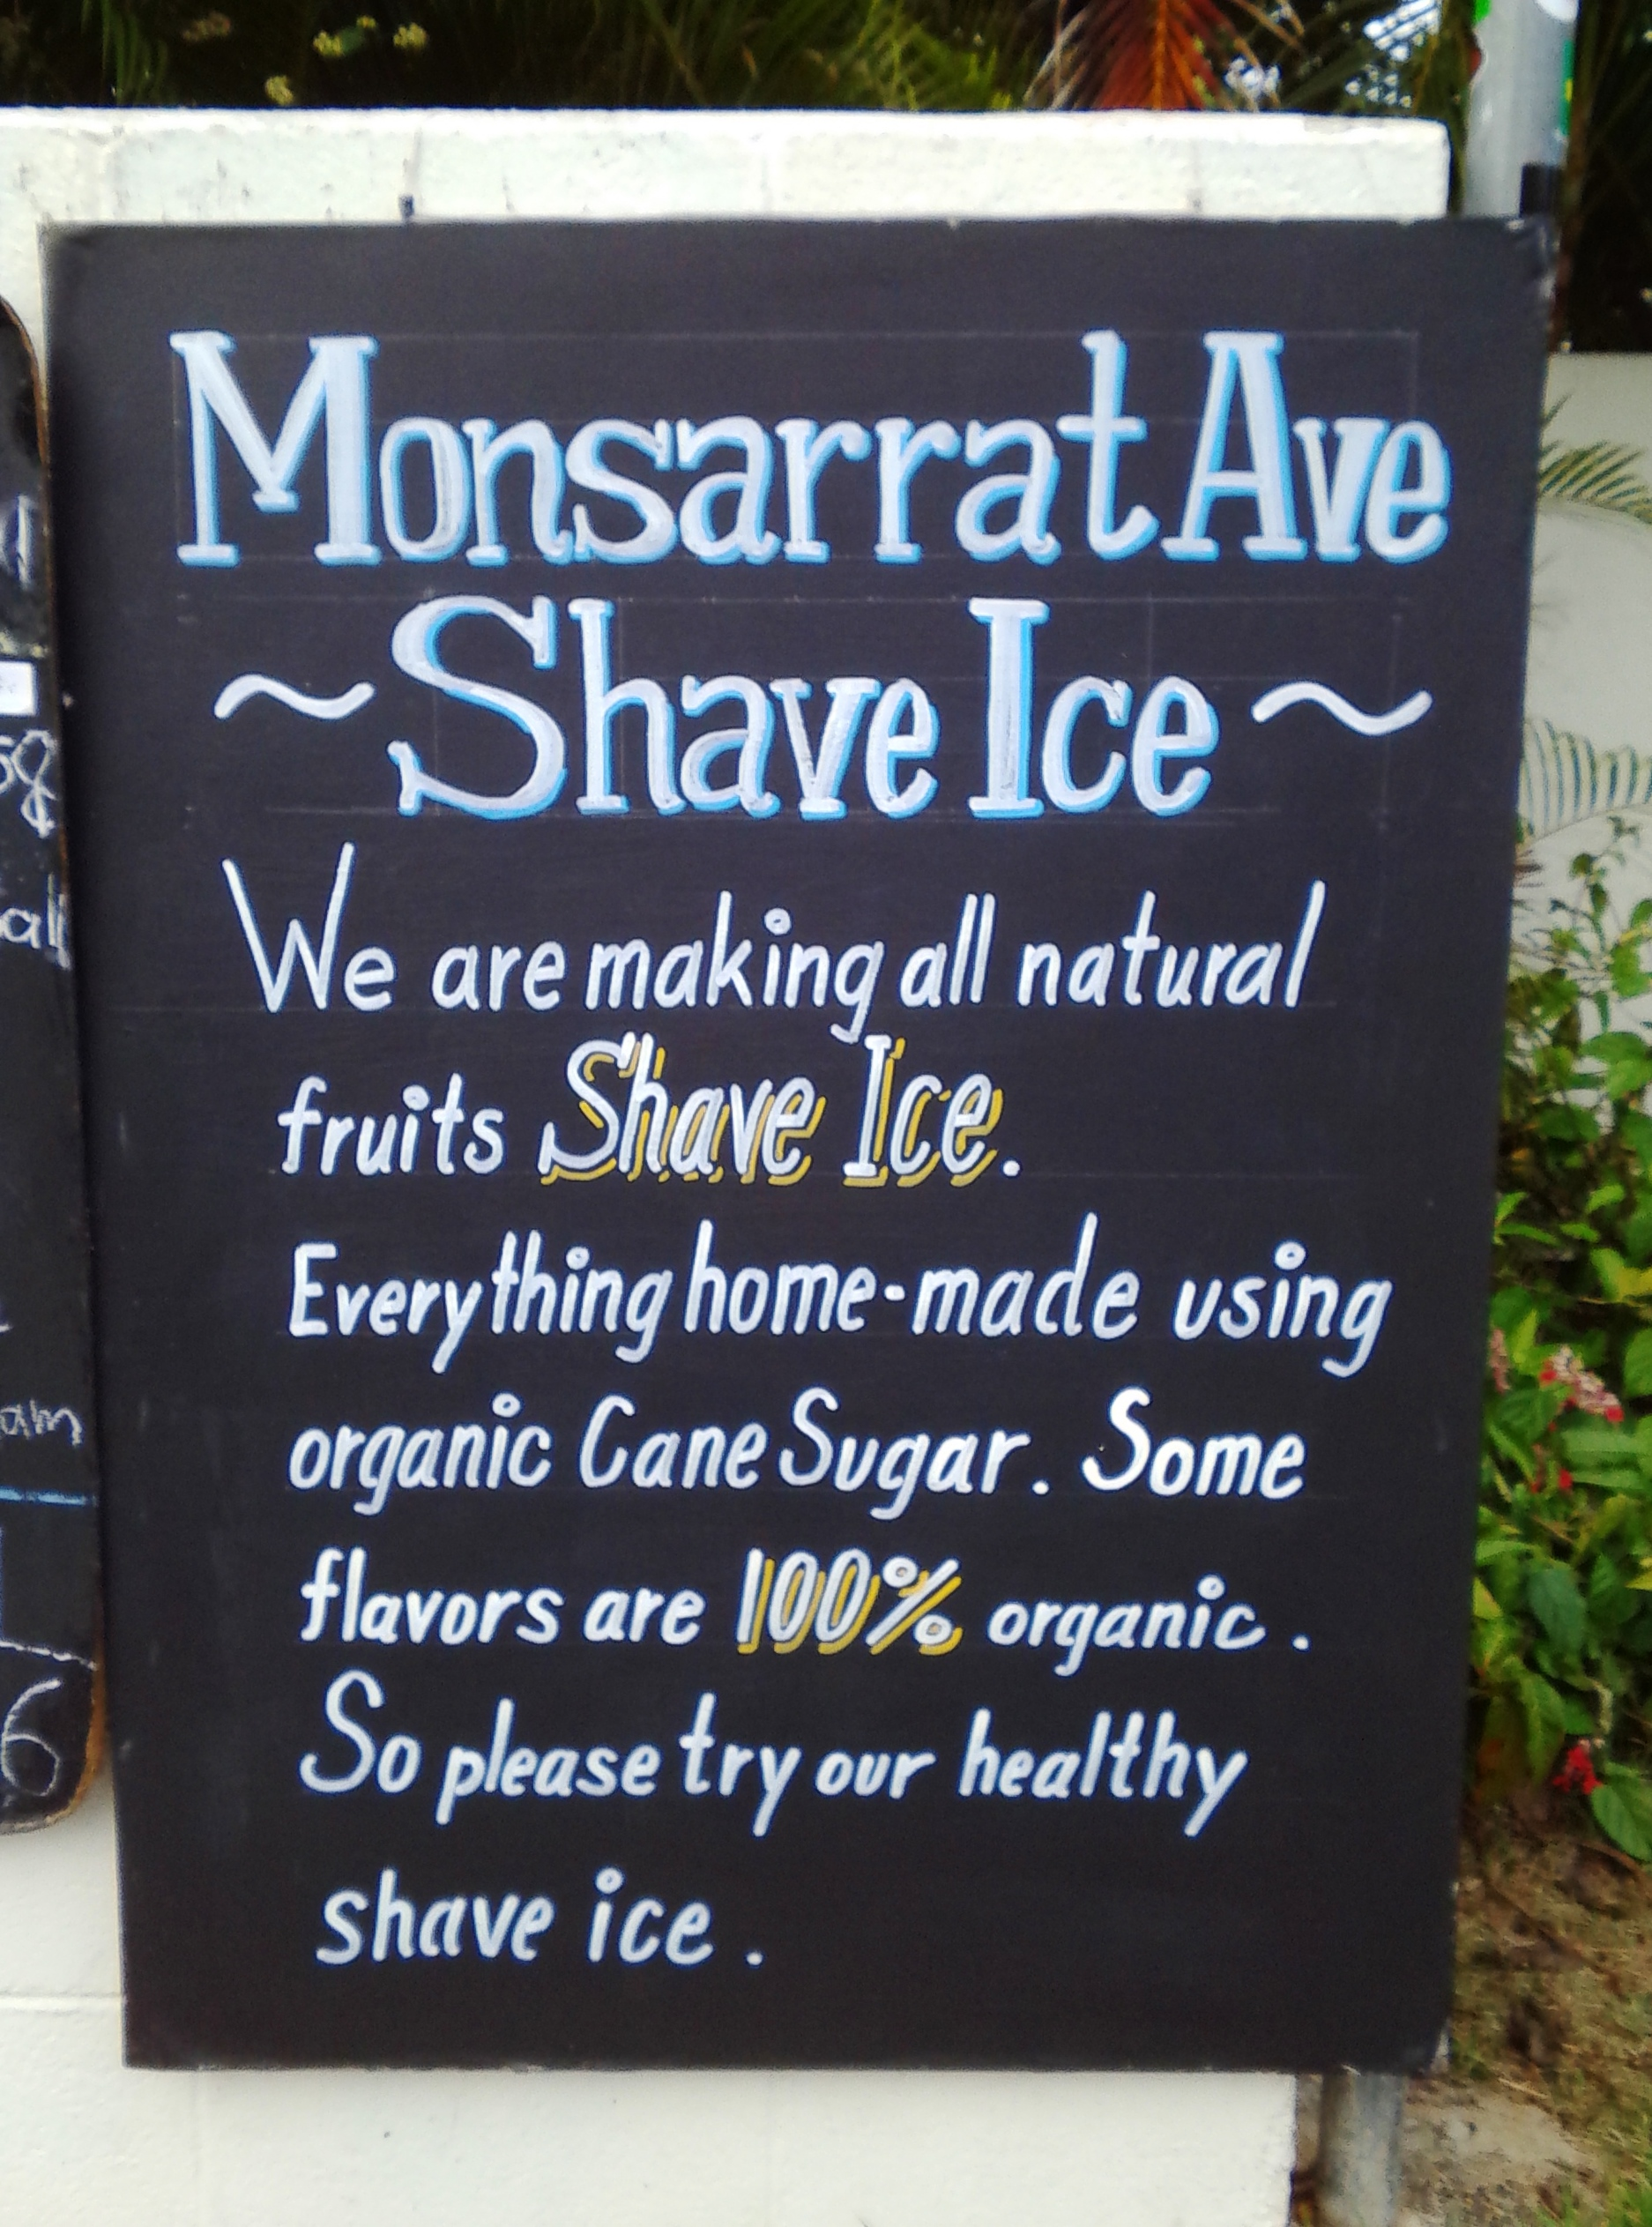 Monsarrat Ave. Shave Ice